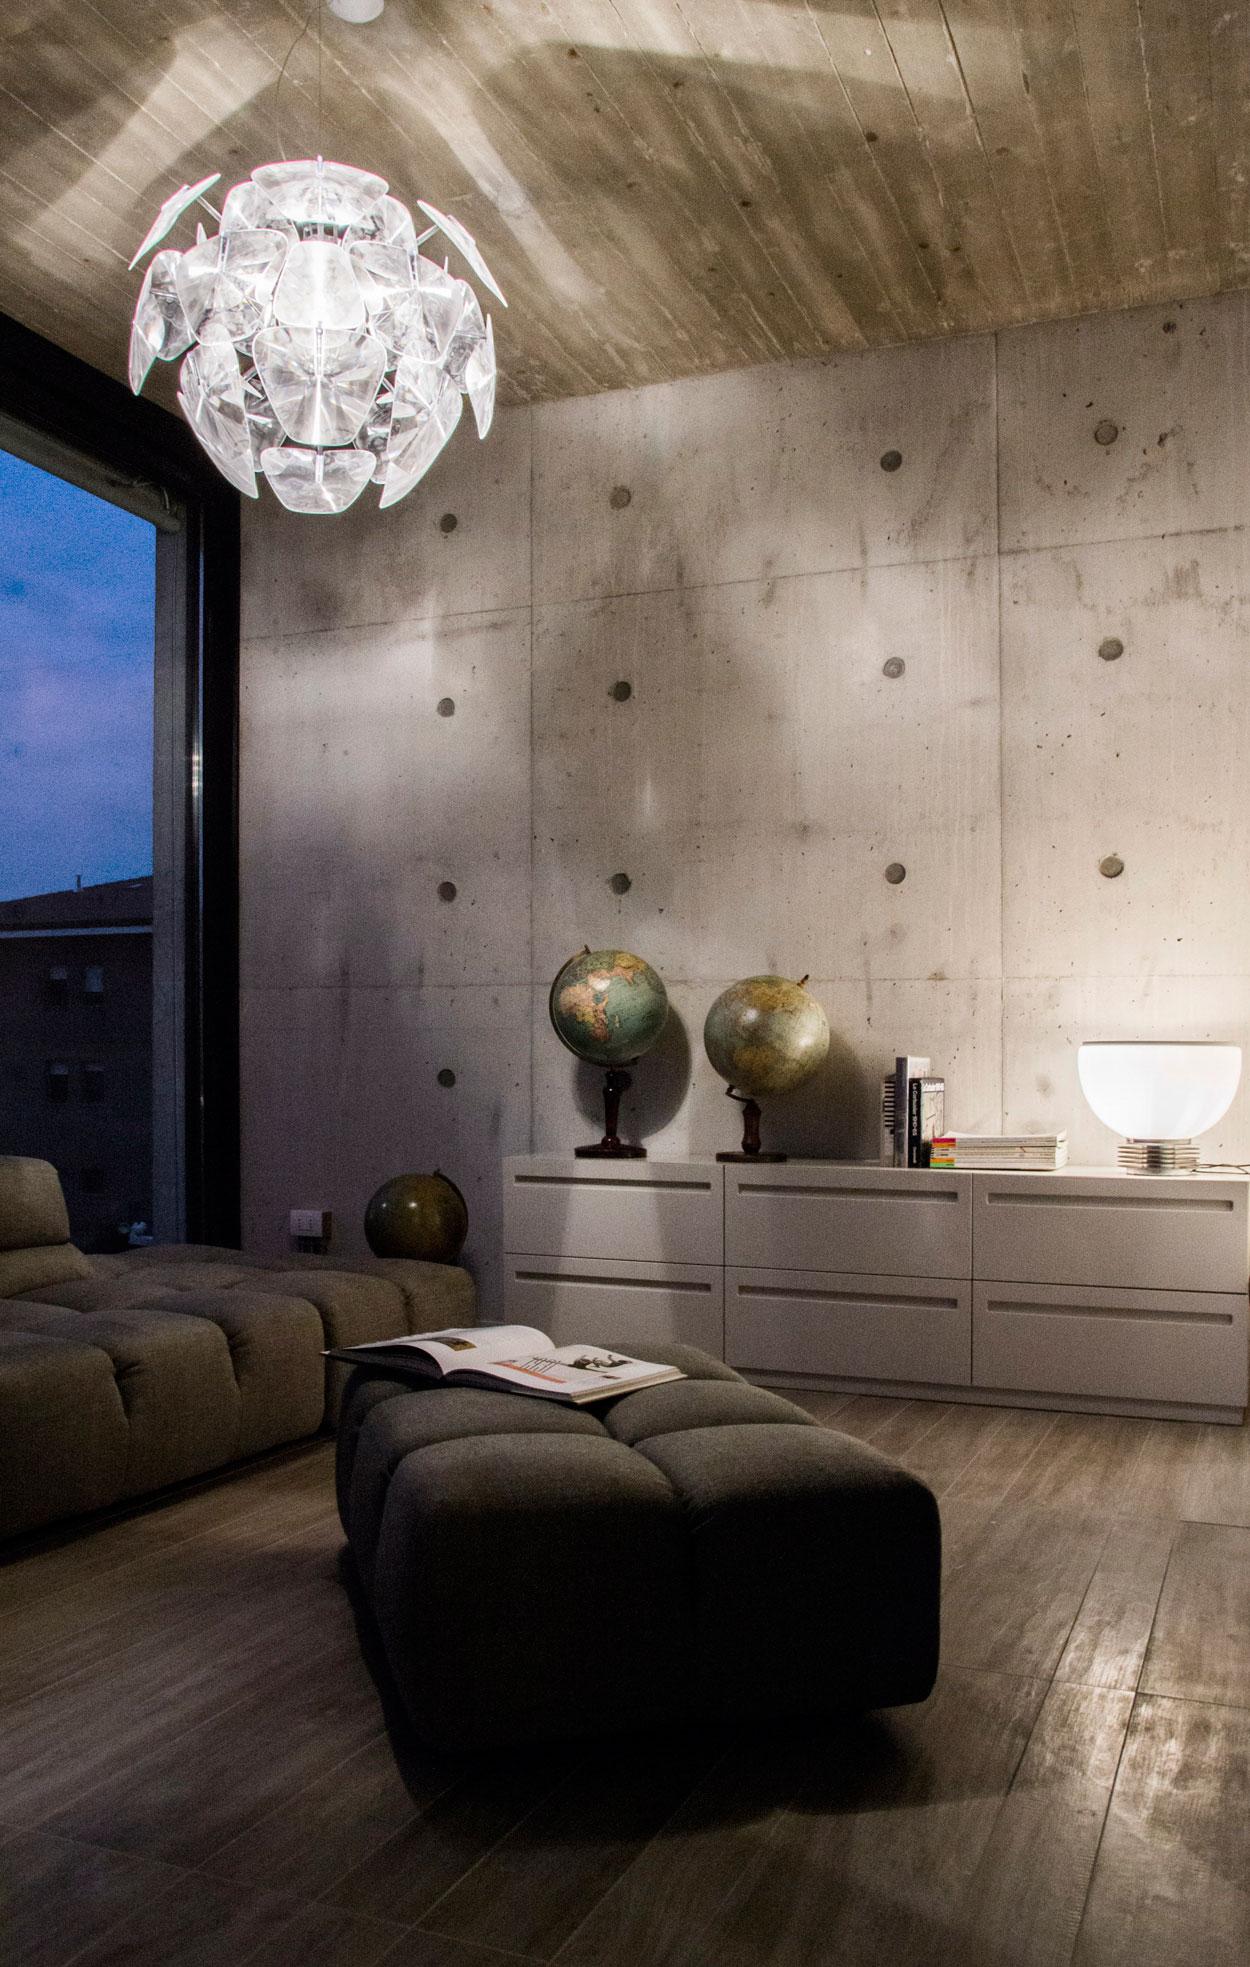 D'Autore Residence near Bologna by Giraldi Associati Architetti-40